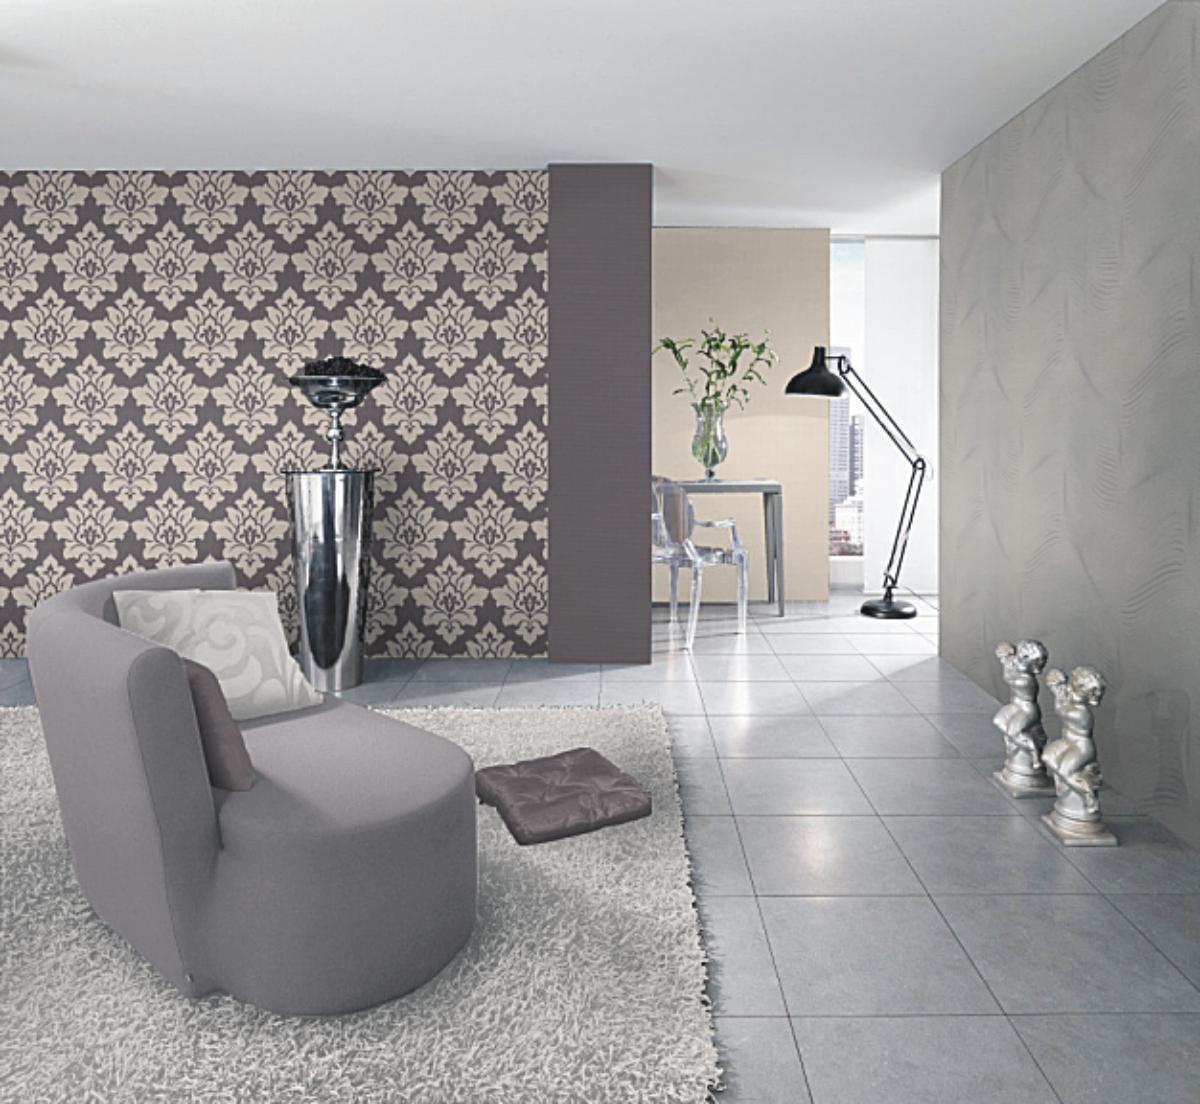 tapeten barbara becker 2013 home passion 779318 neu. Black Bedroom Furniture Sets. Home Design Ideas